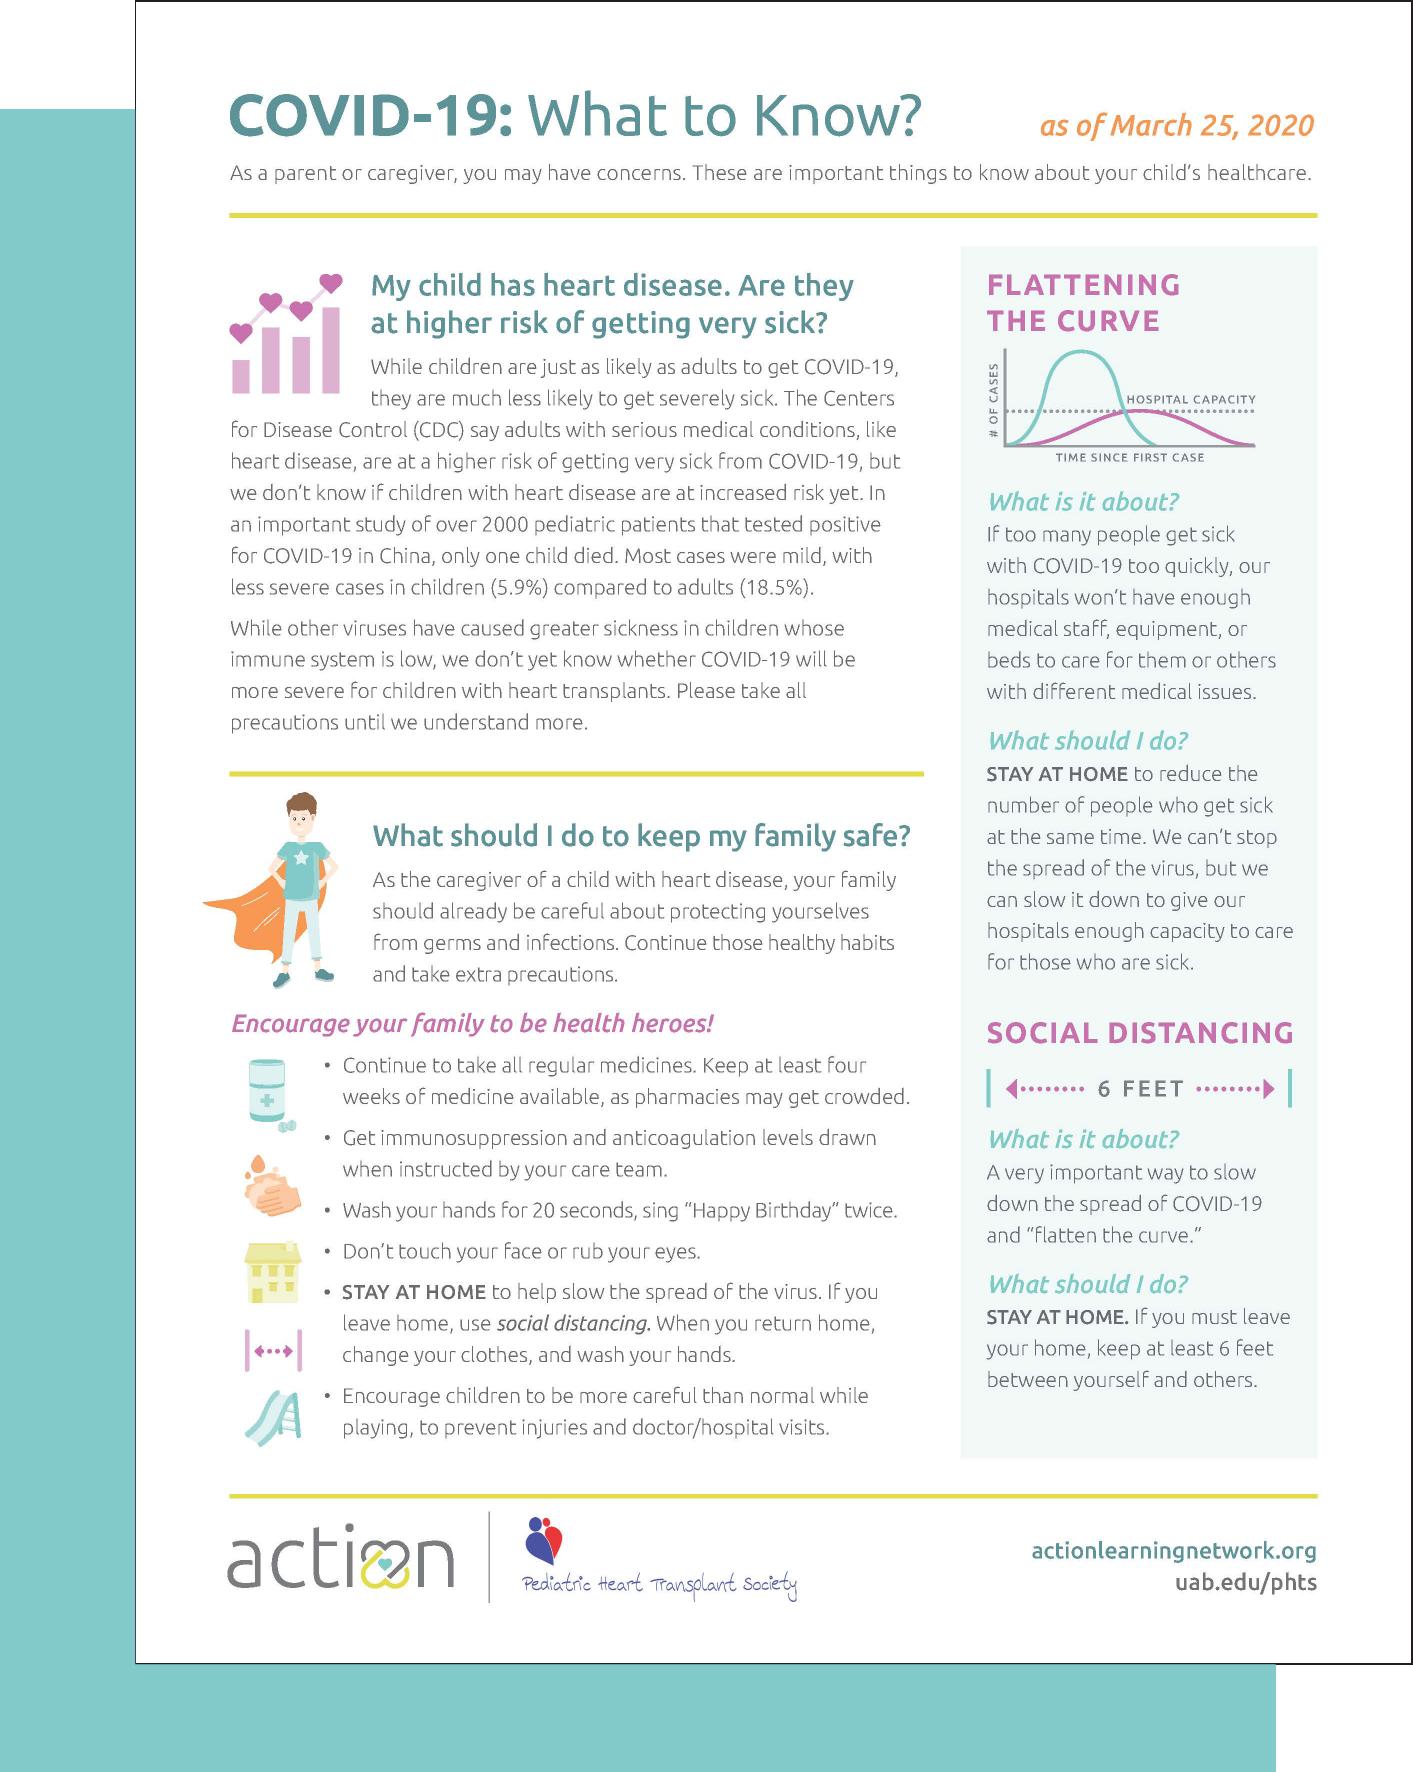 COVID-19: What Parents Should Know